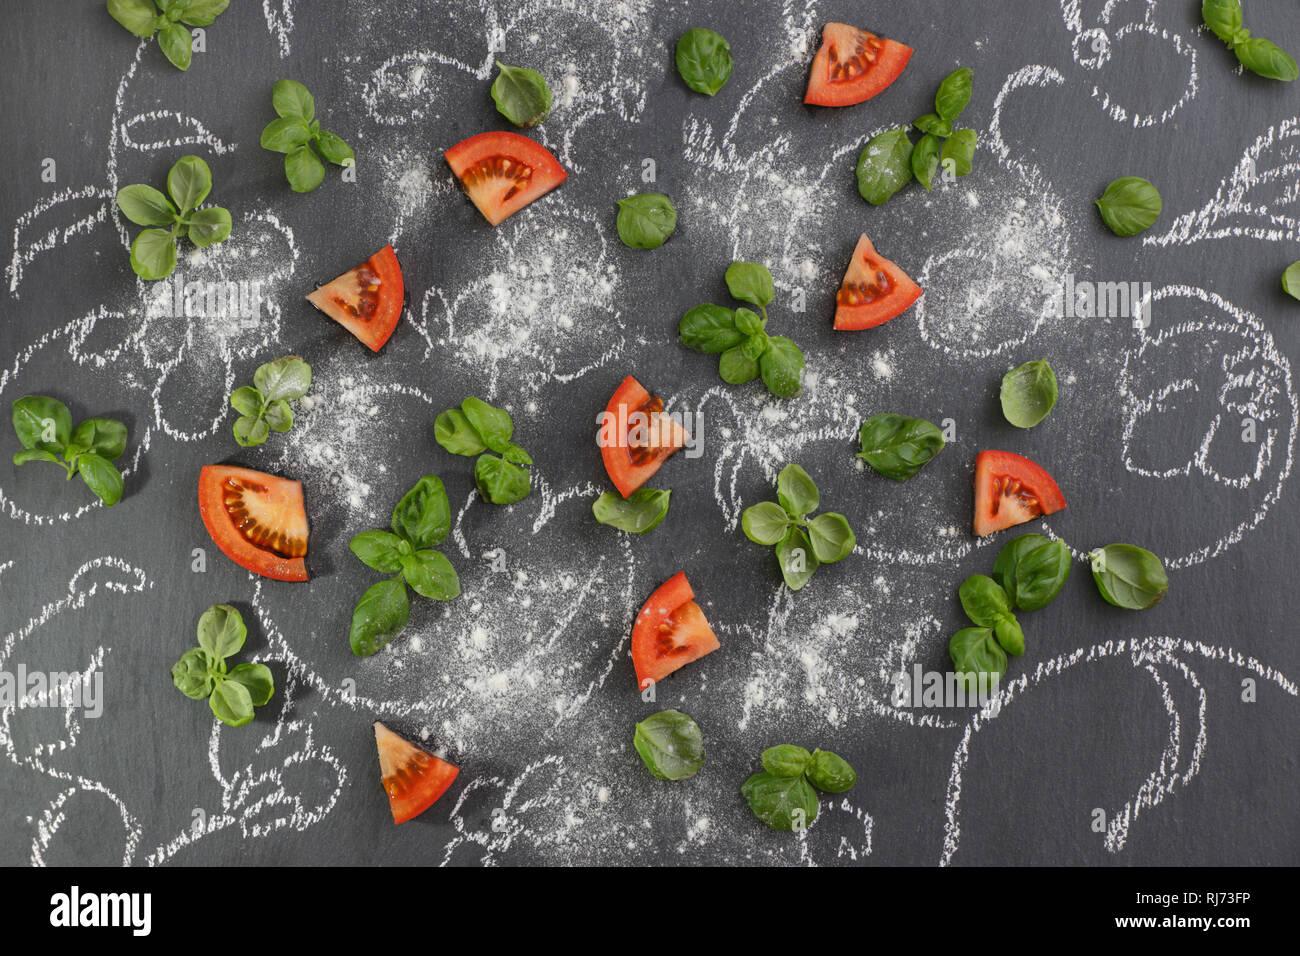 Tomaten mit Basilikum auf mit Kreide bemalter Tafel Stock Photo